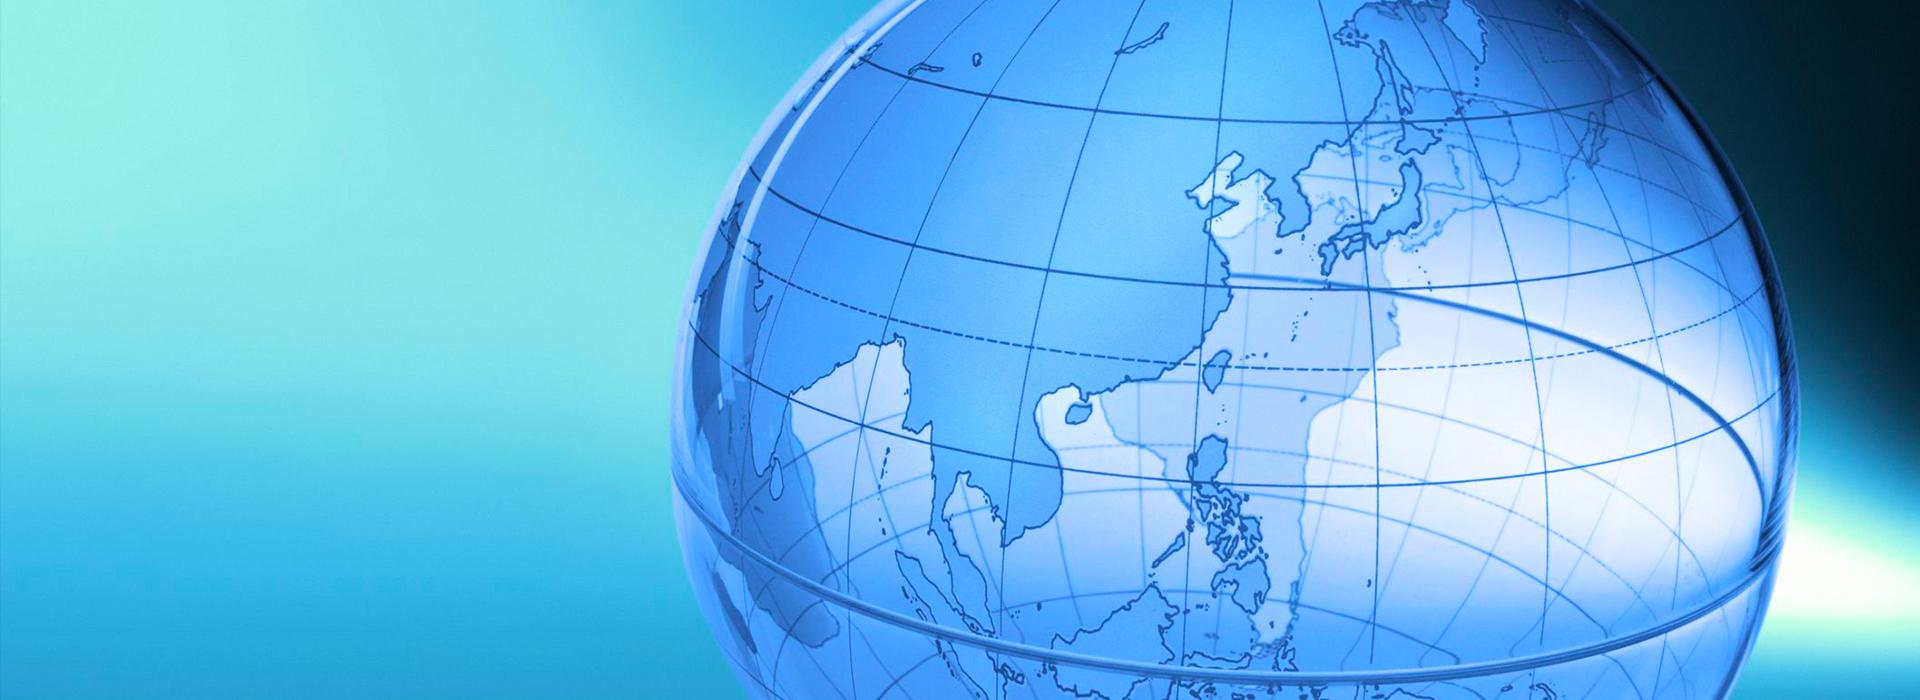 CSUSB Palm Desert Campus to host 2020 Academic WorldQuest Competition